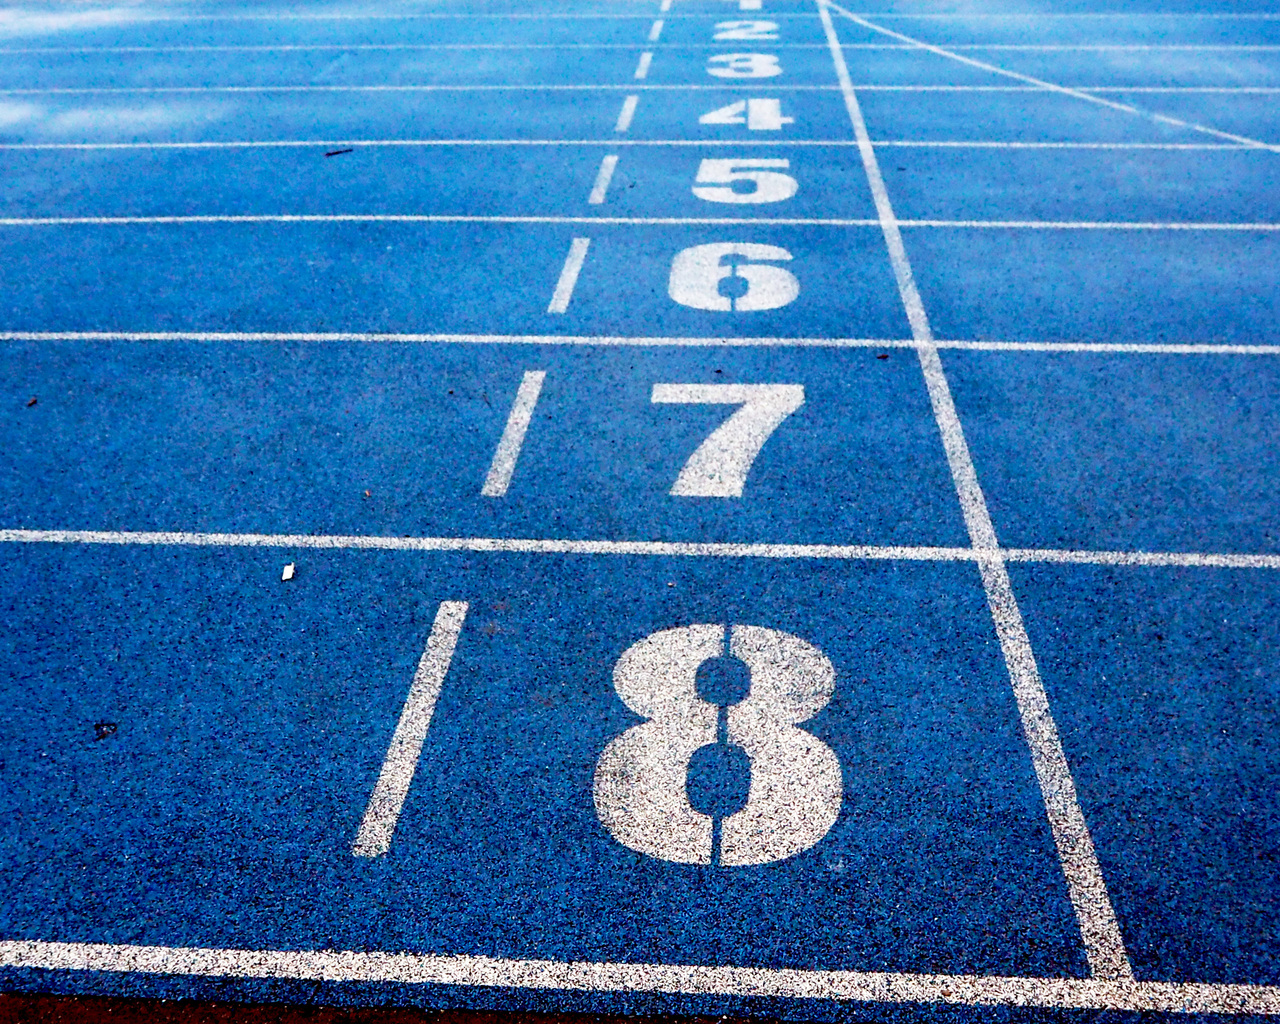 running-track-numbers-eu.jpg